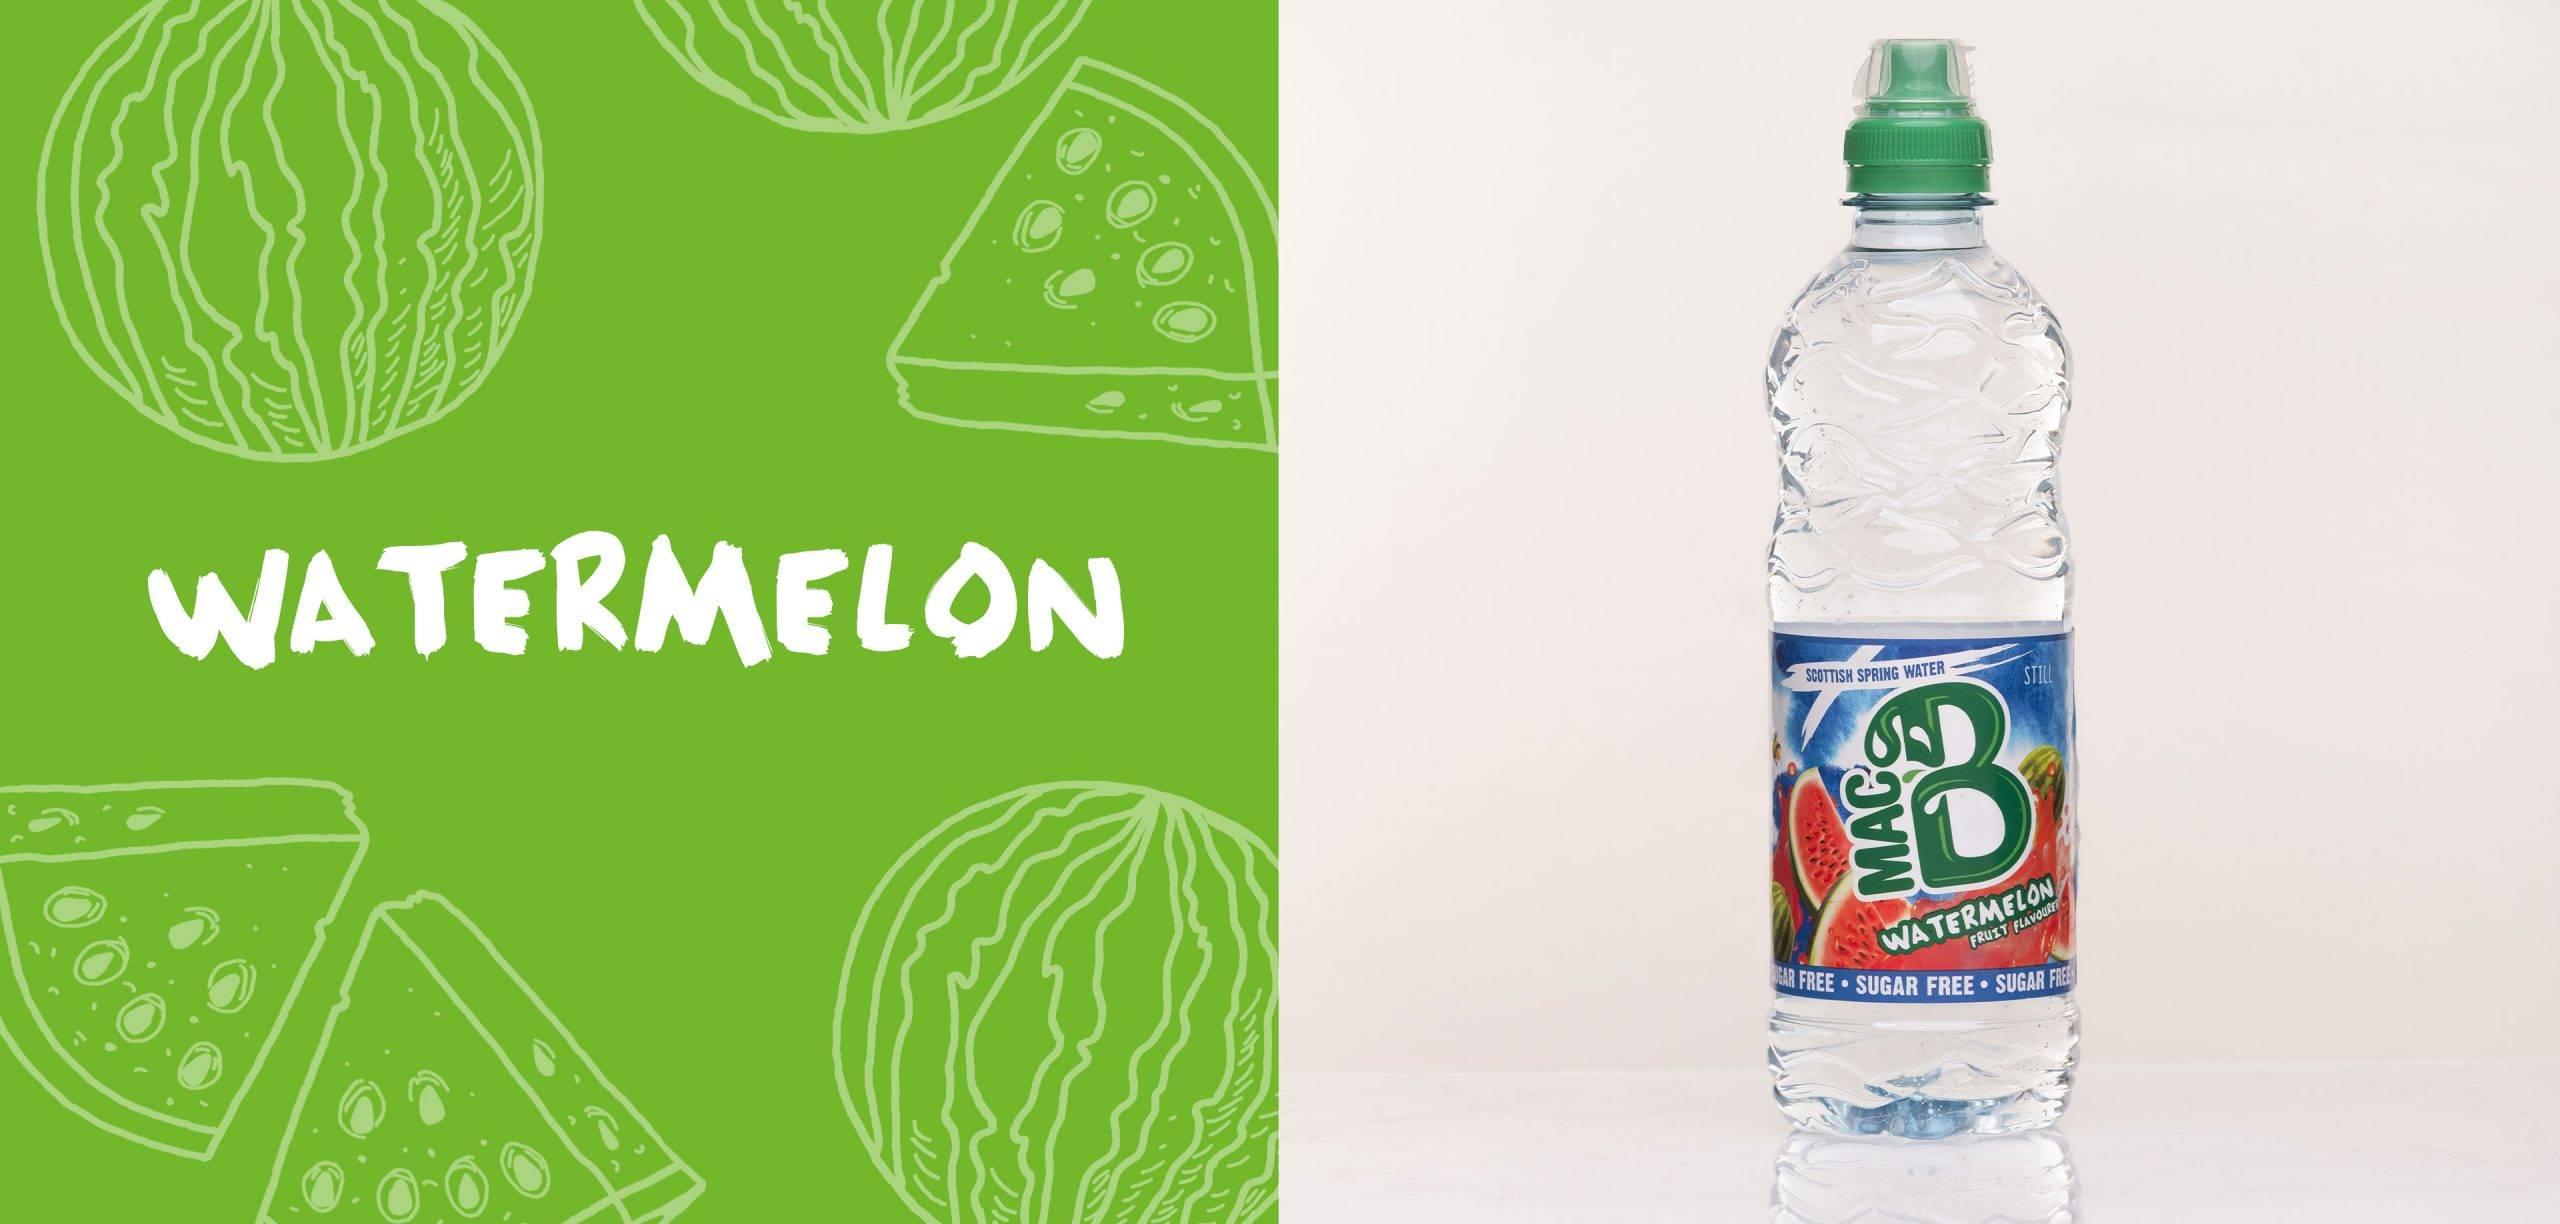 Watermelon flavoured Macb water in a 500ml bottle